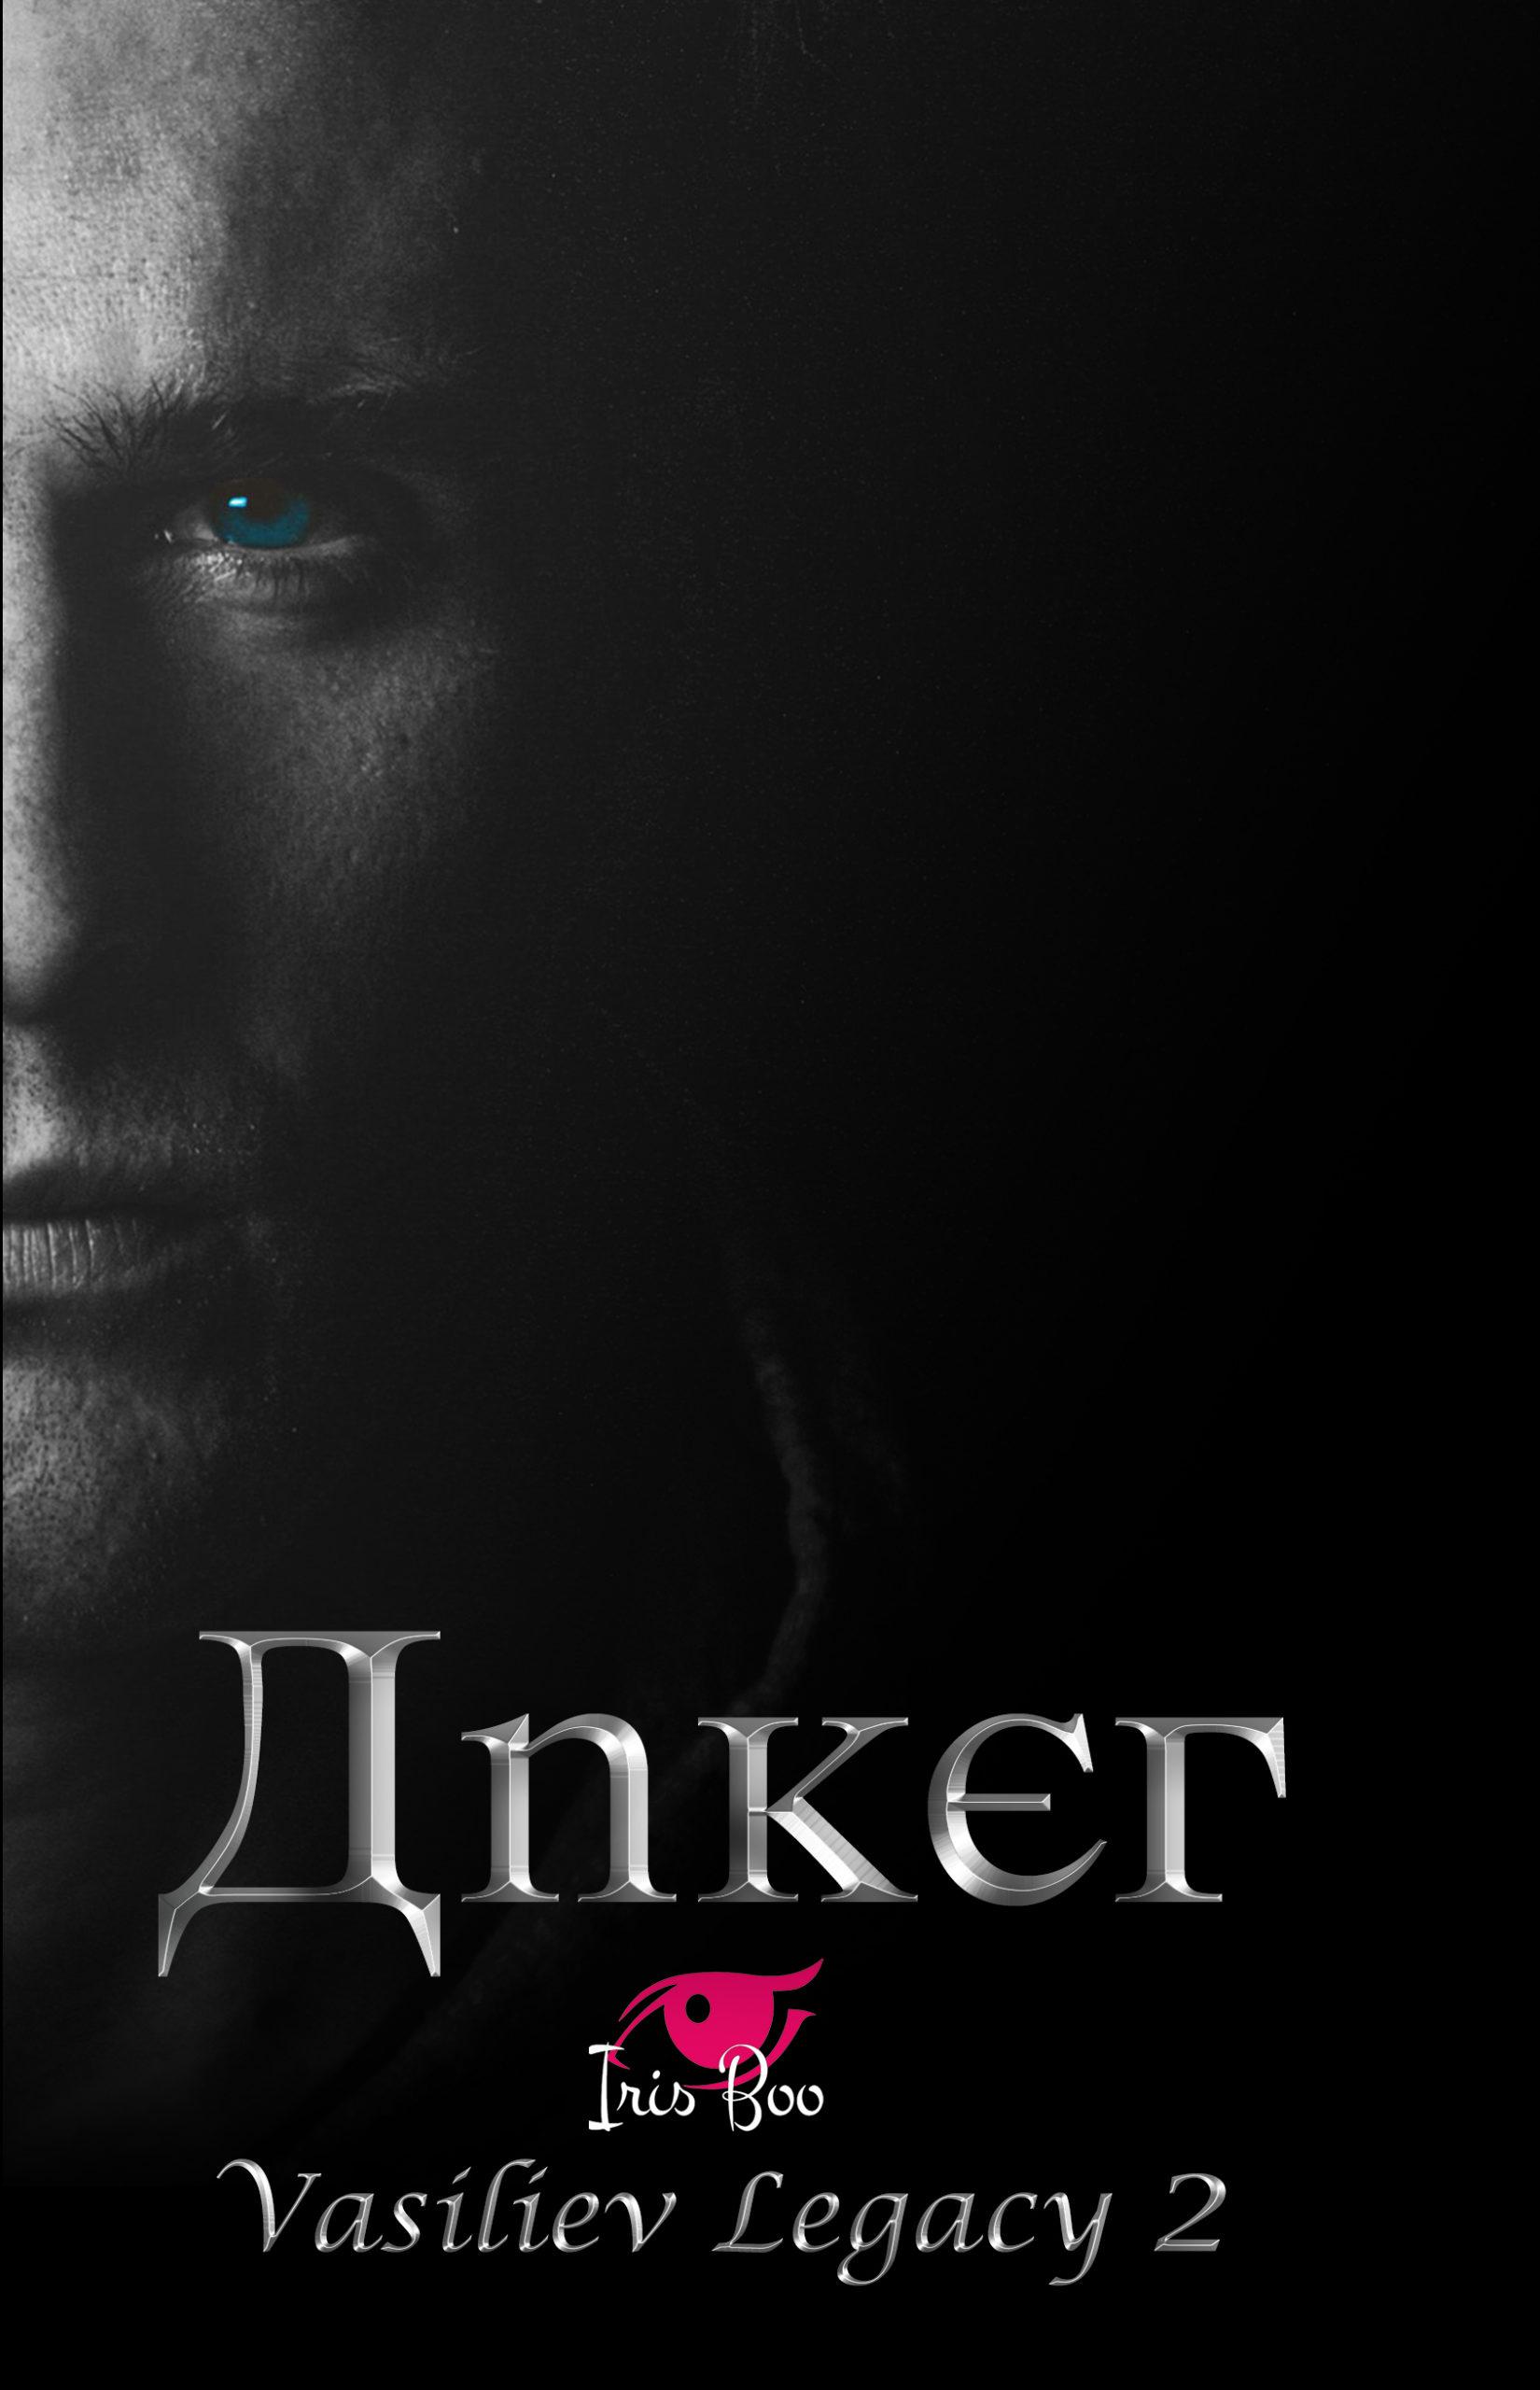 L2- Anker- 20€